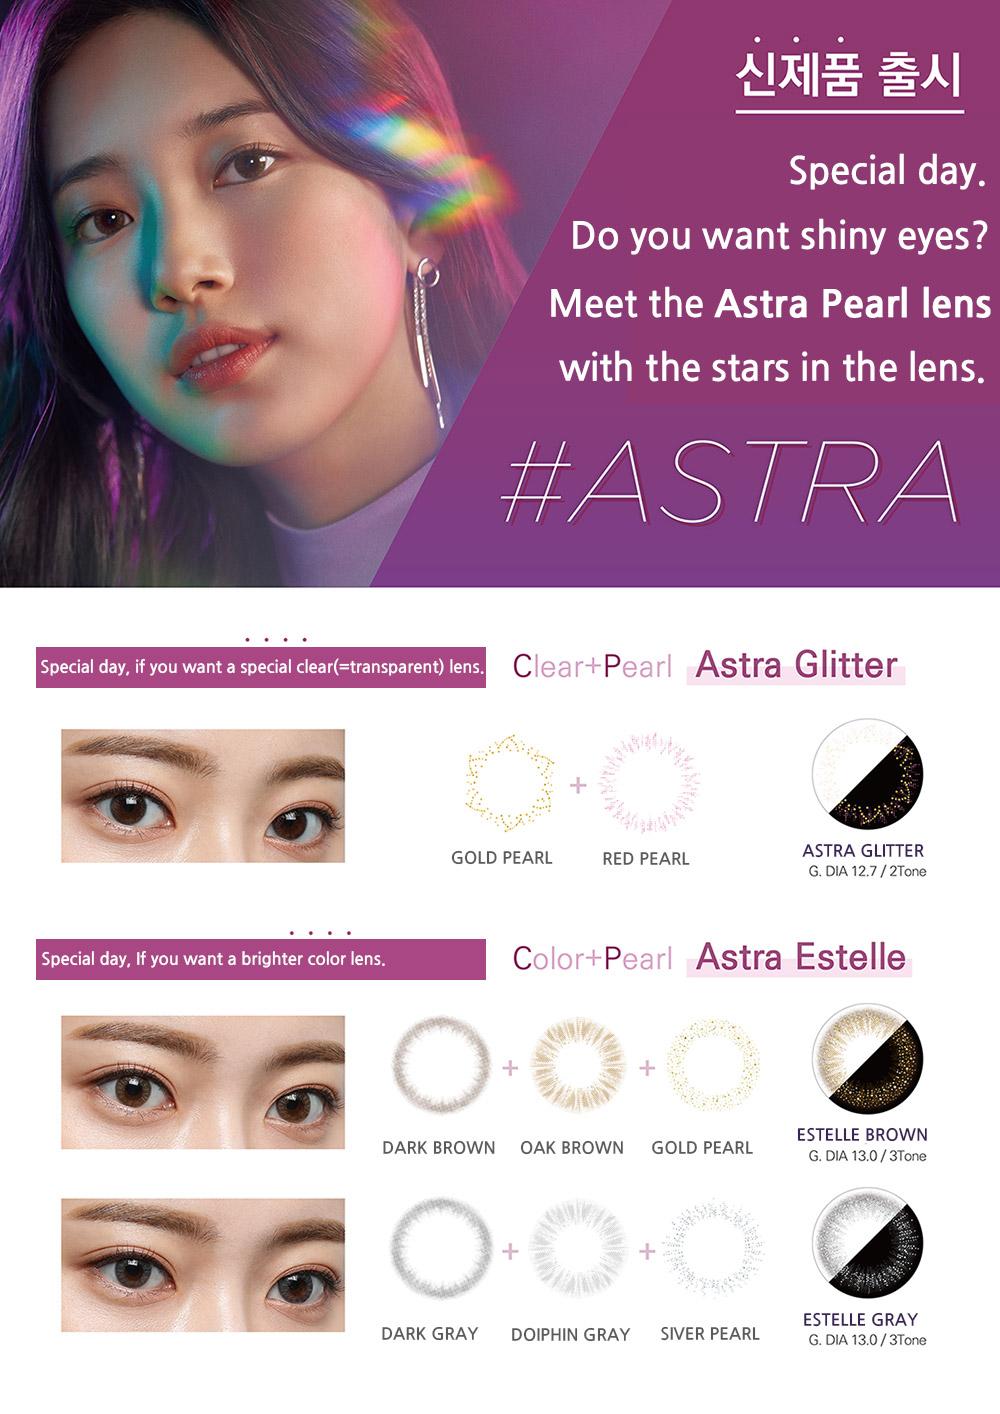 astra-pearl-lens-suzy-circle-lens1.jpg